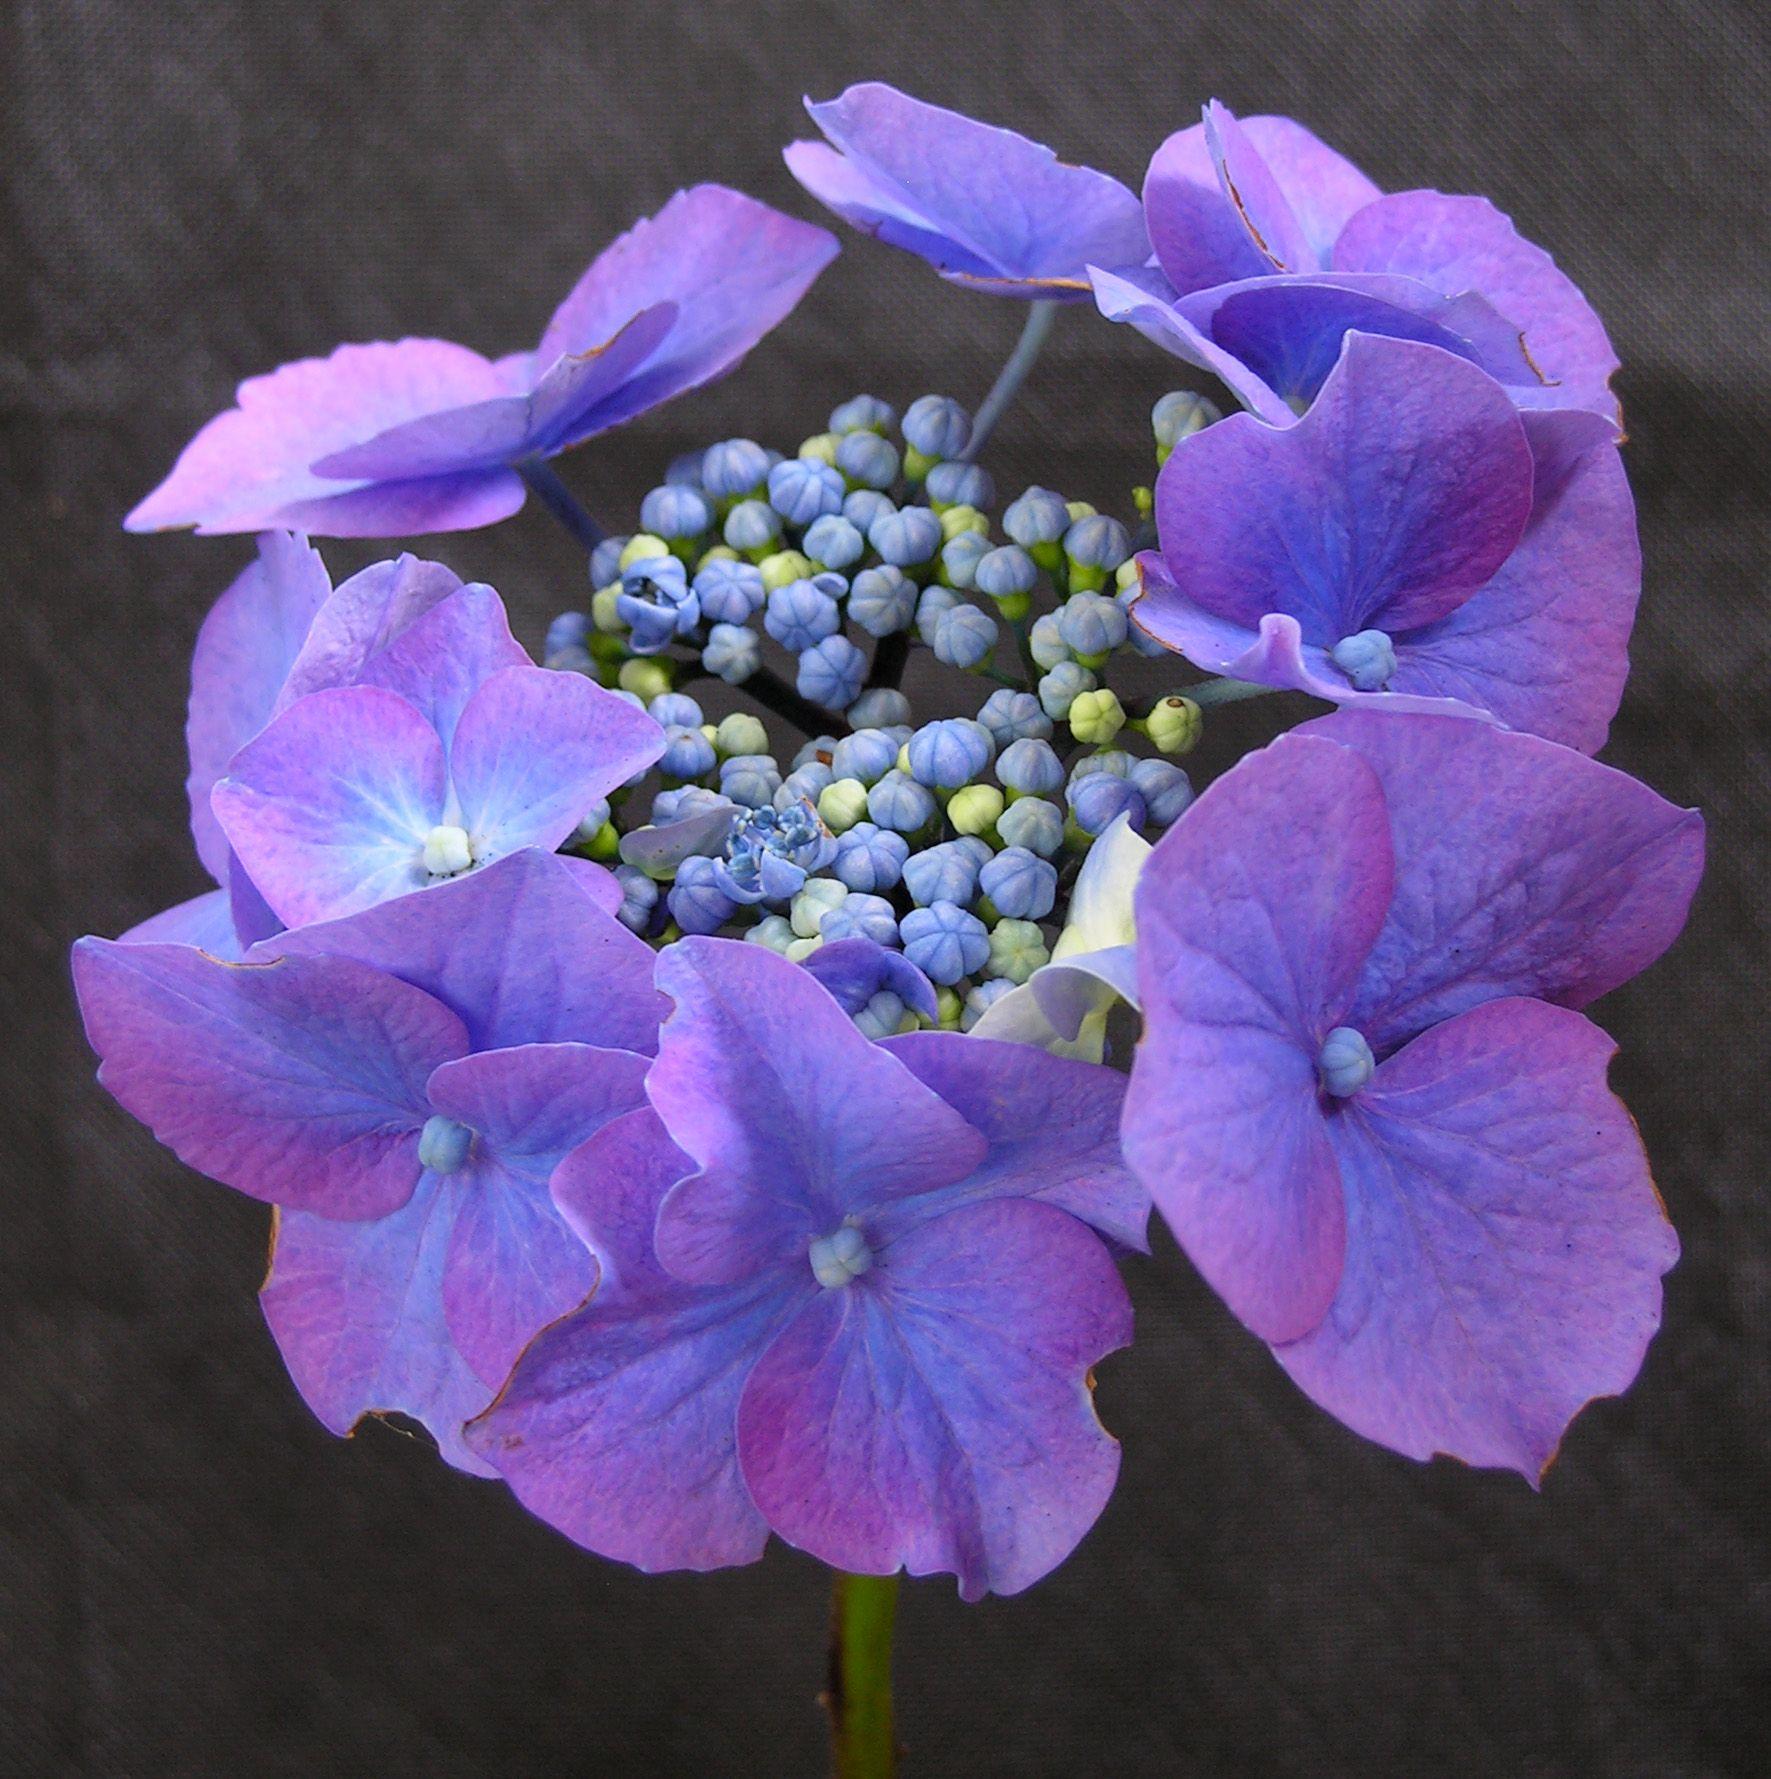 Hydrangea Macrophylla Blaumeise Synonyms Teller Blue Blue Sky Most Hydrangea Experts Agree This Is Hydrangea Garden Hydrangea Macrophylla Macrophylla